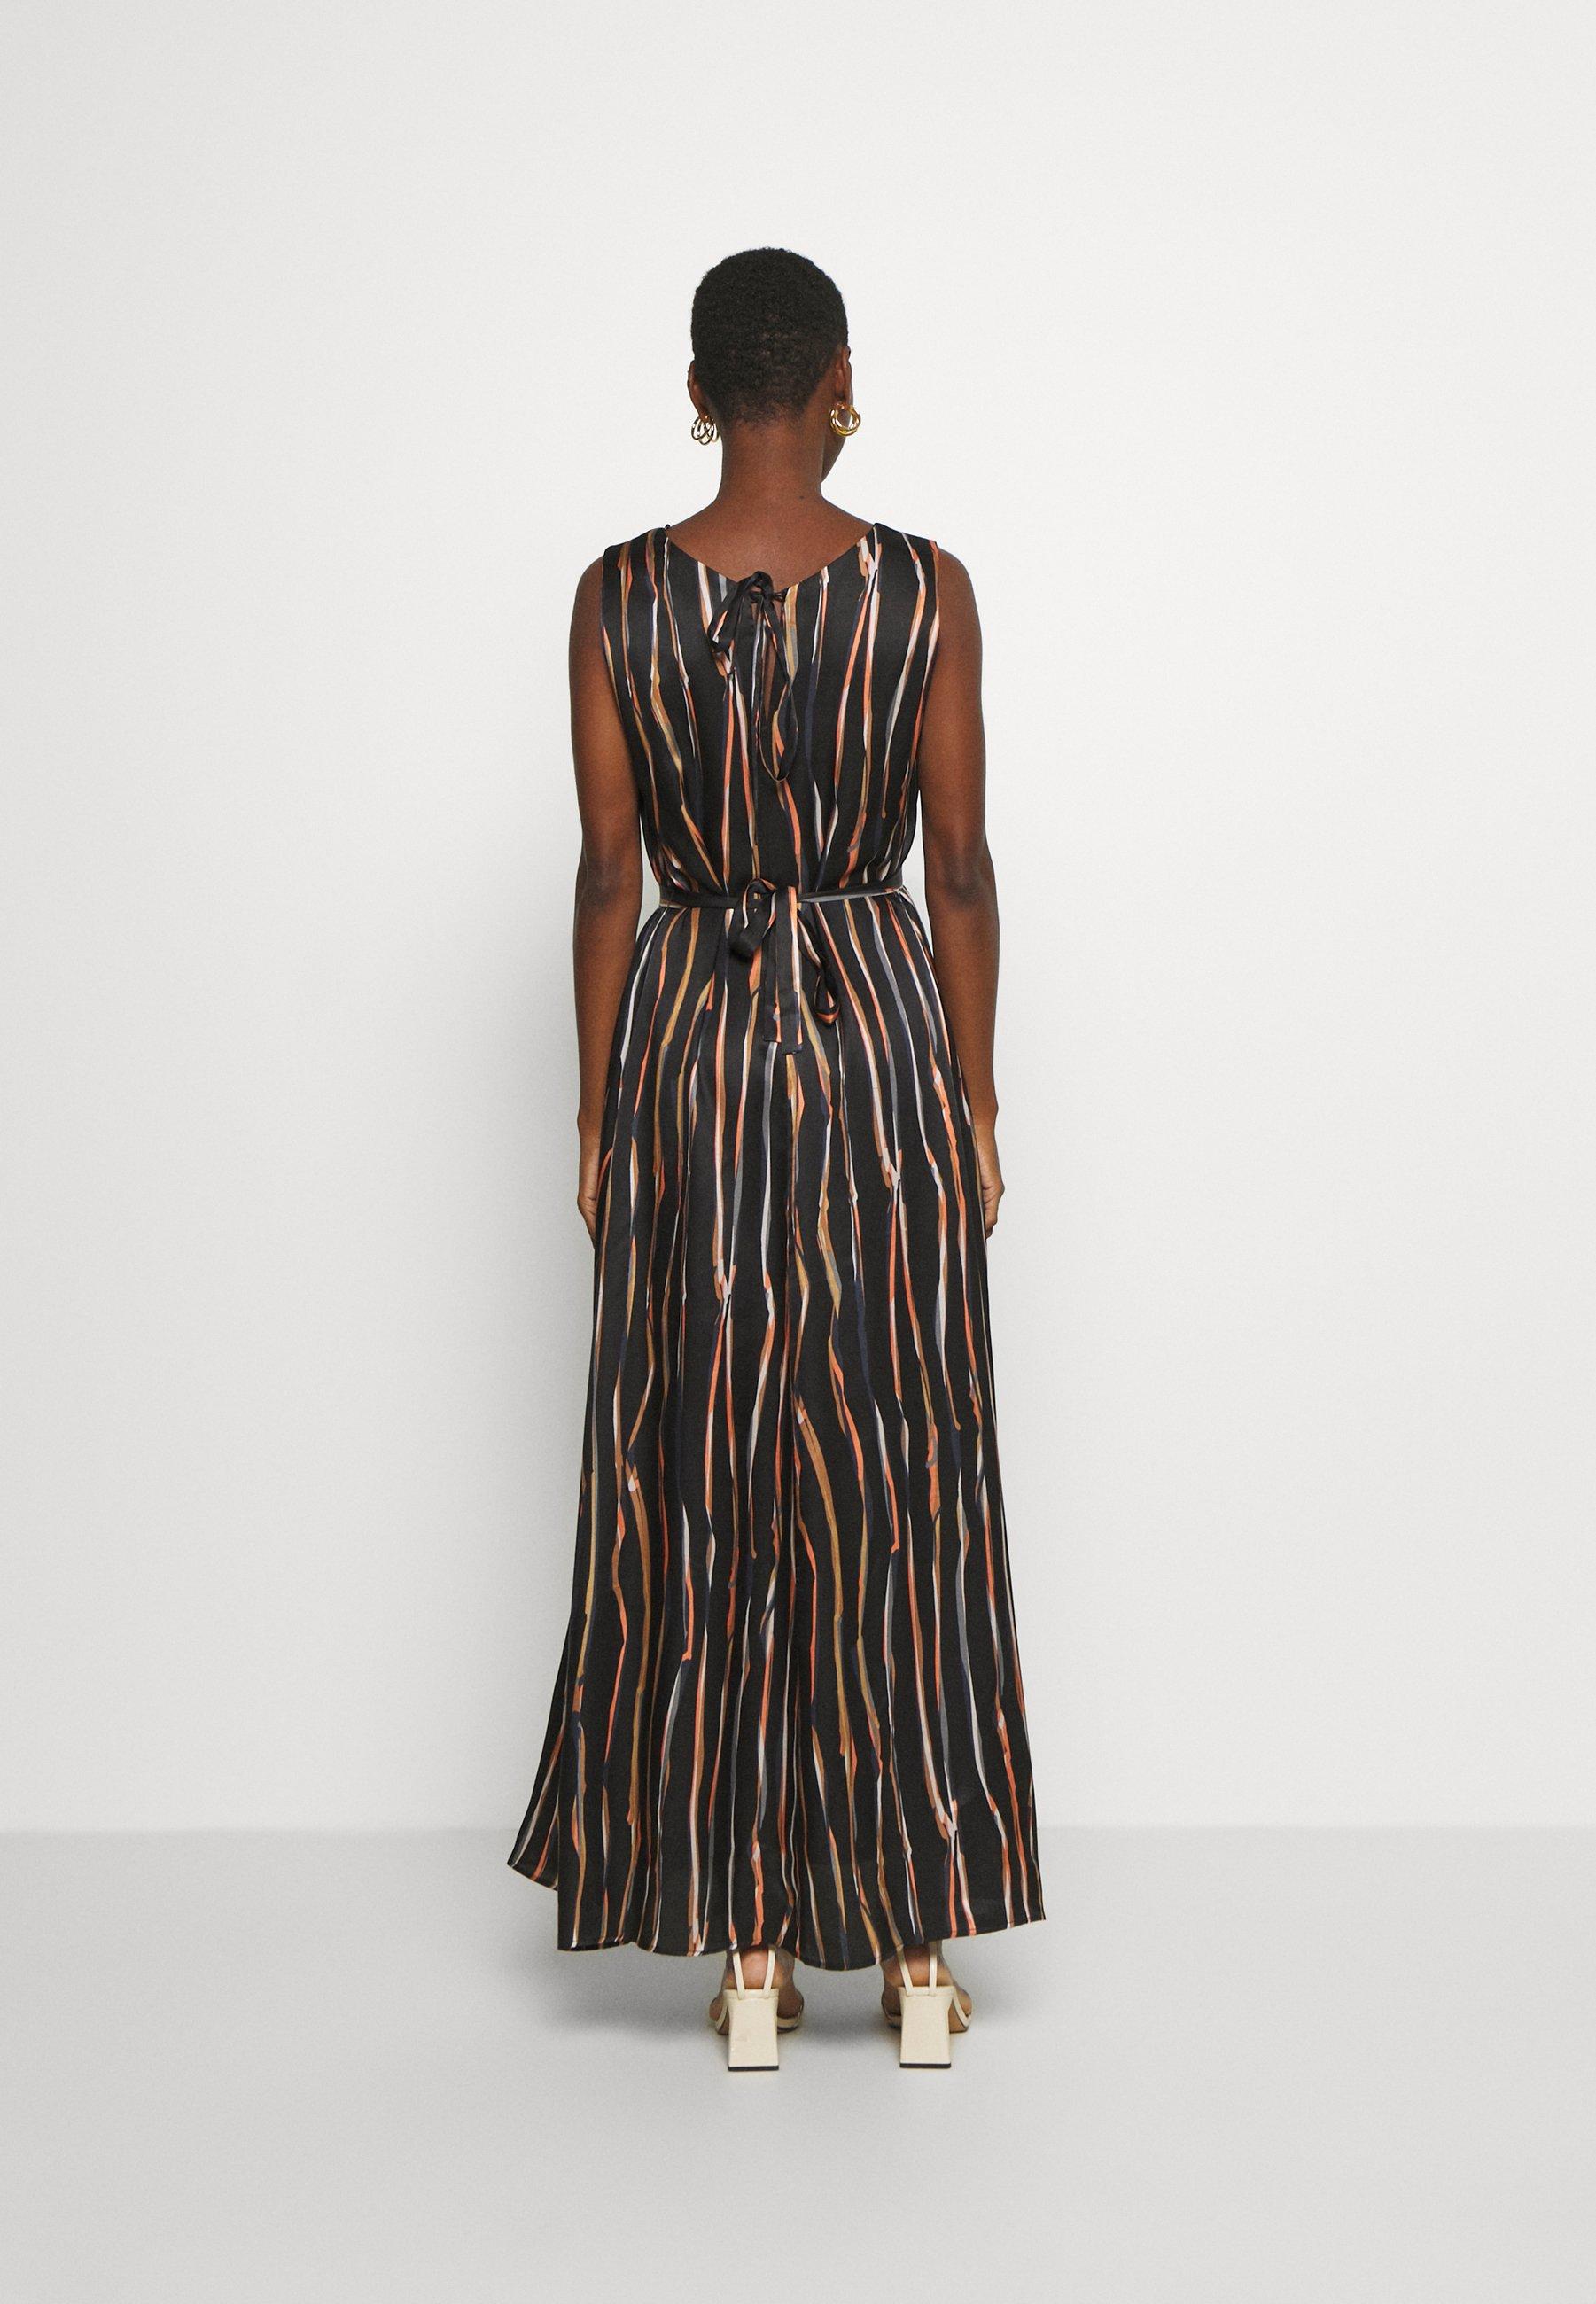 Safe Payment Women's Clothing Marc O'Polo PURE DRESS SLEEVELESS BELT Maxi dress multi/black l6SkYTS1F